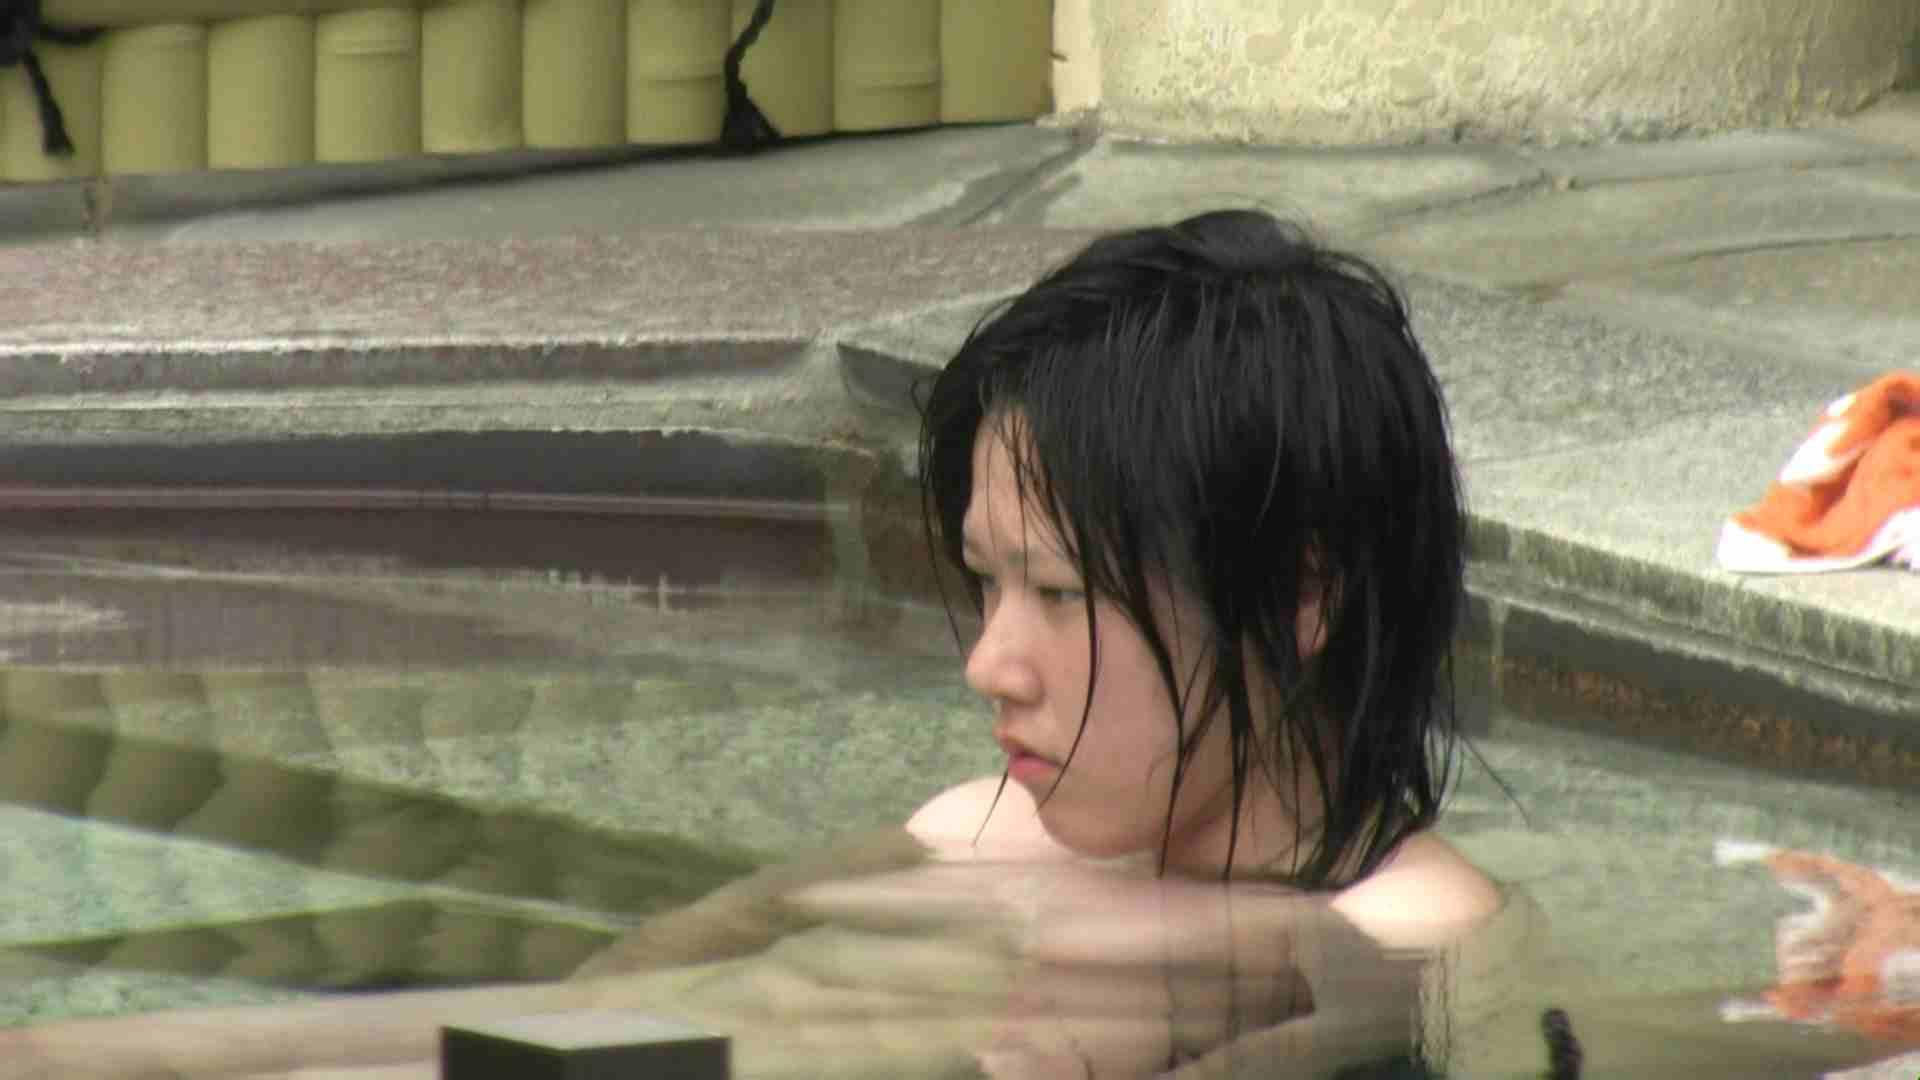 Aquaな露天風呂Vol.36 盗撮 | HなOL  68pic 41